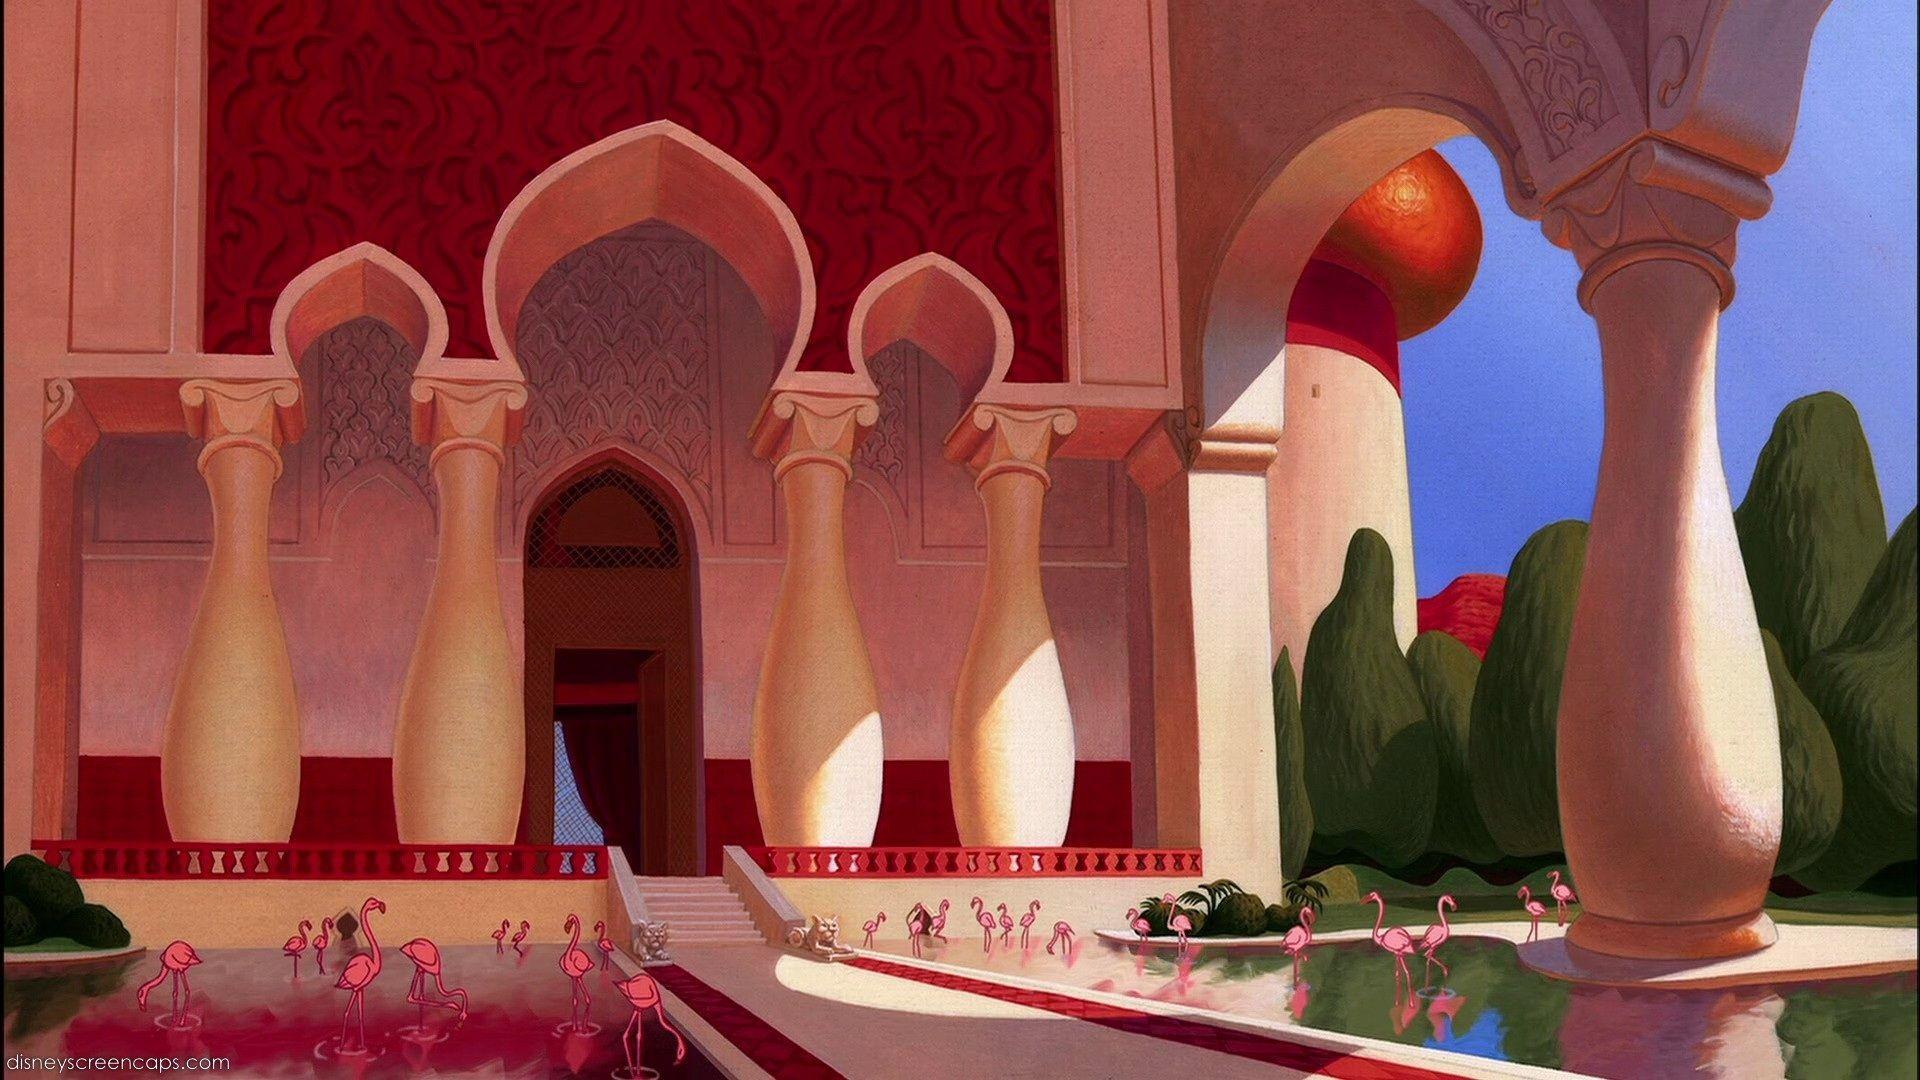 Empty Backdrop From Aladdin Disney Crossover 30345248 1920